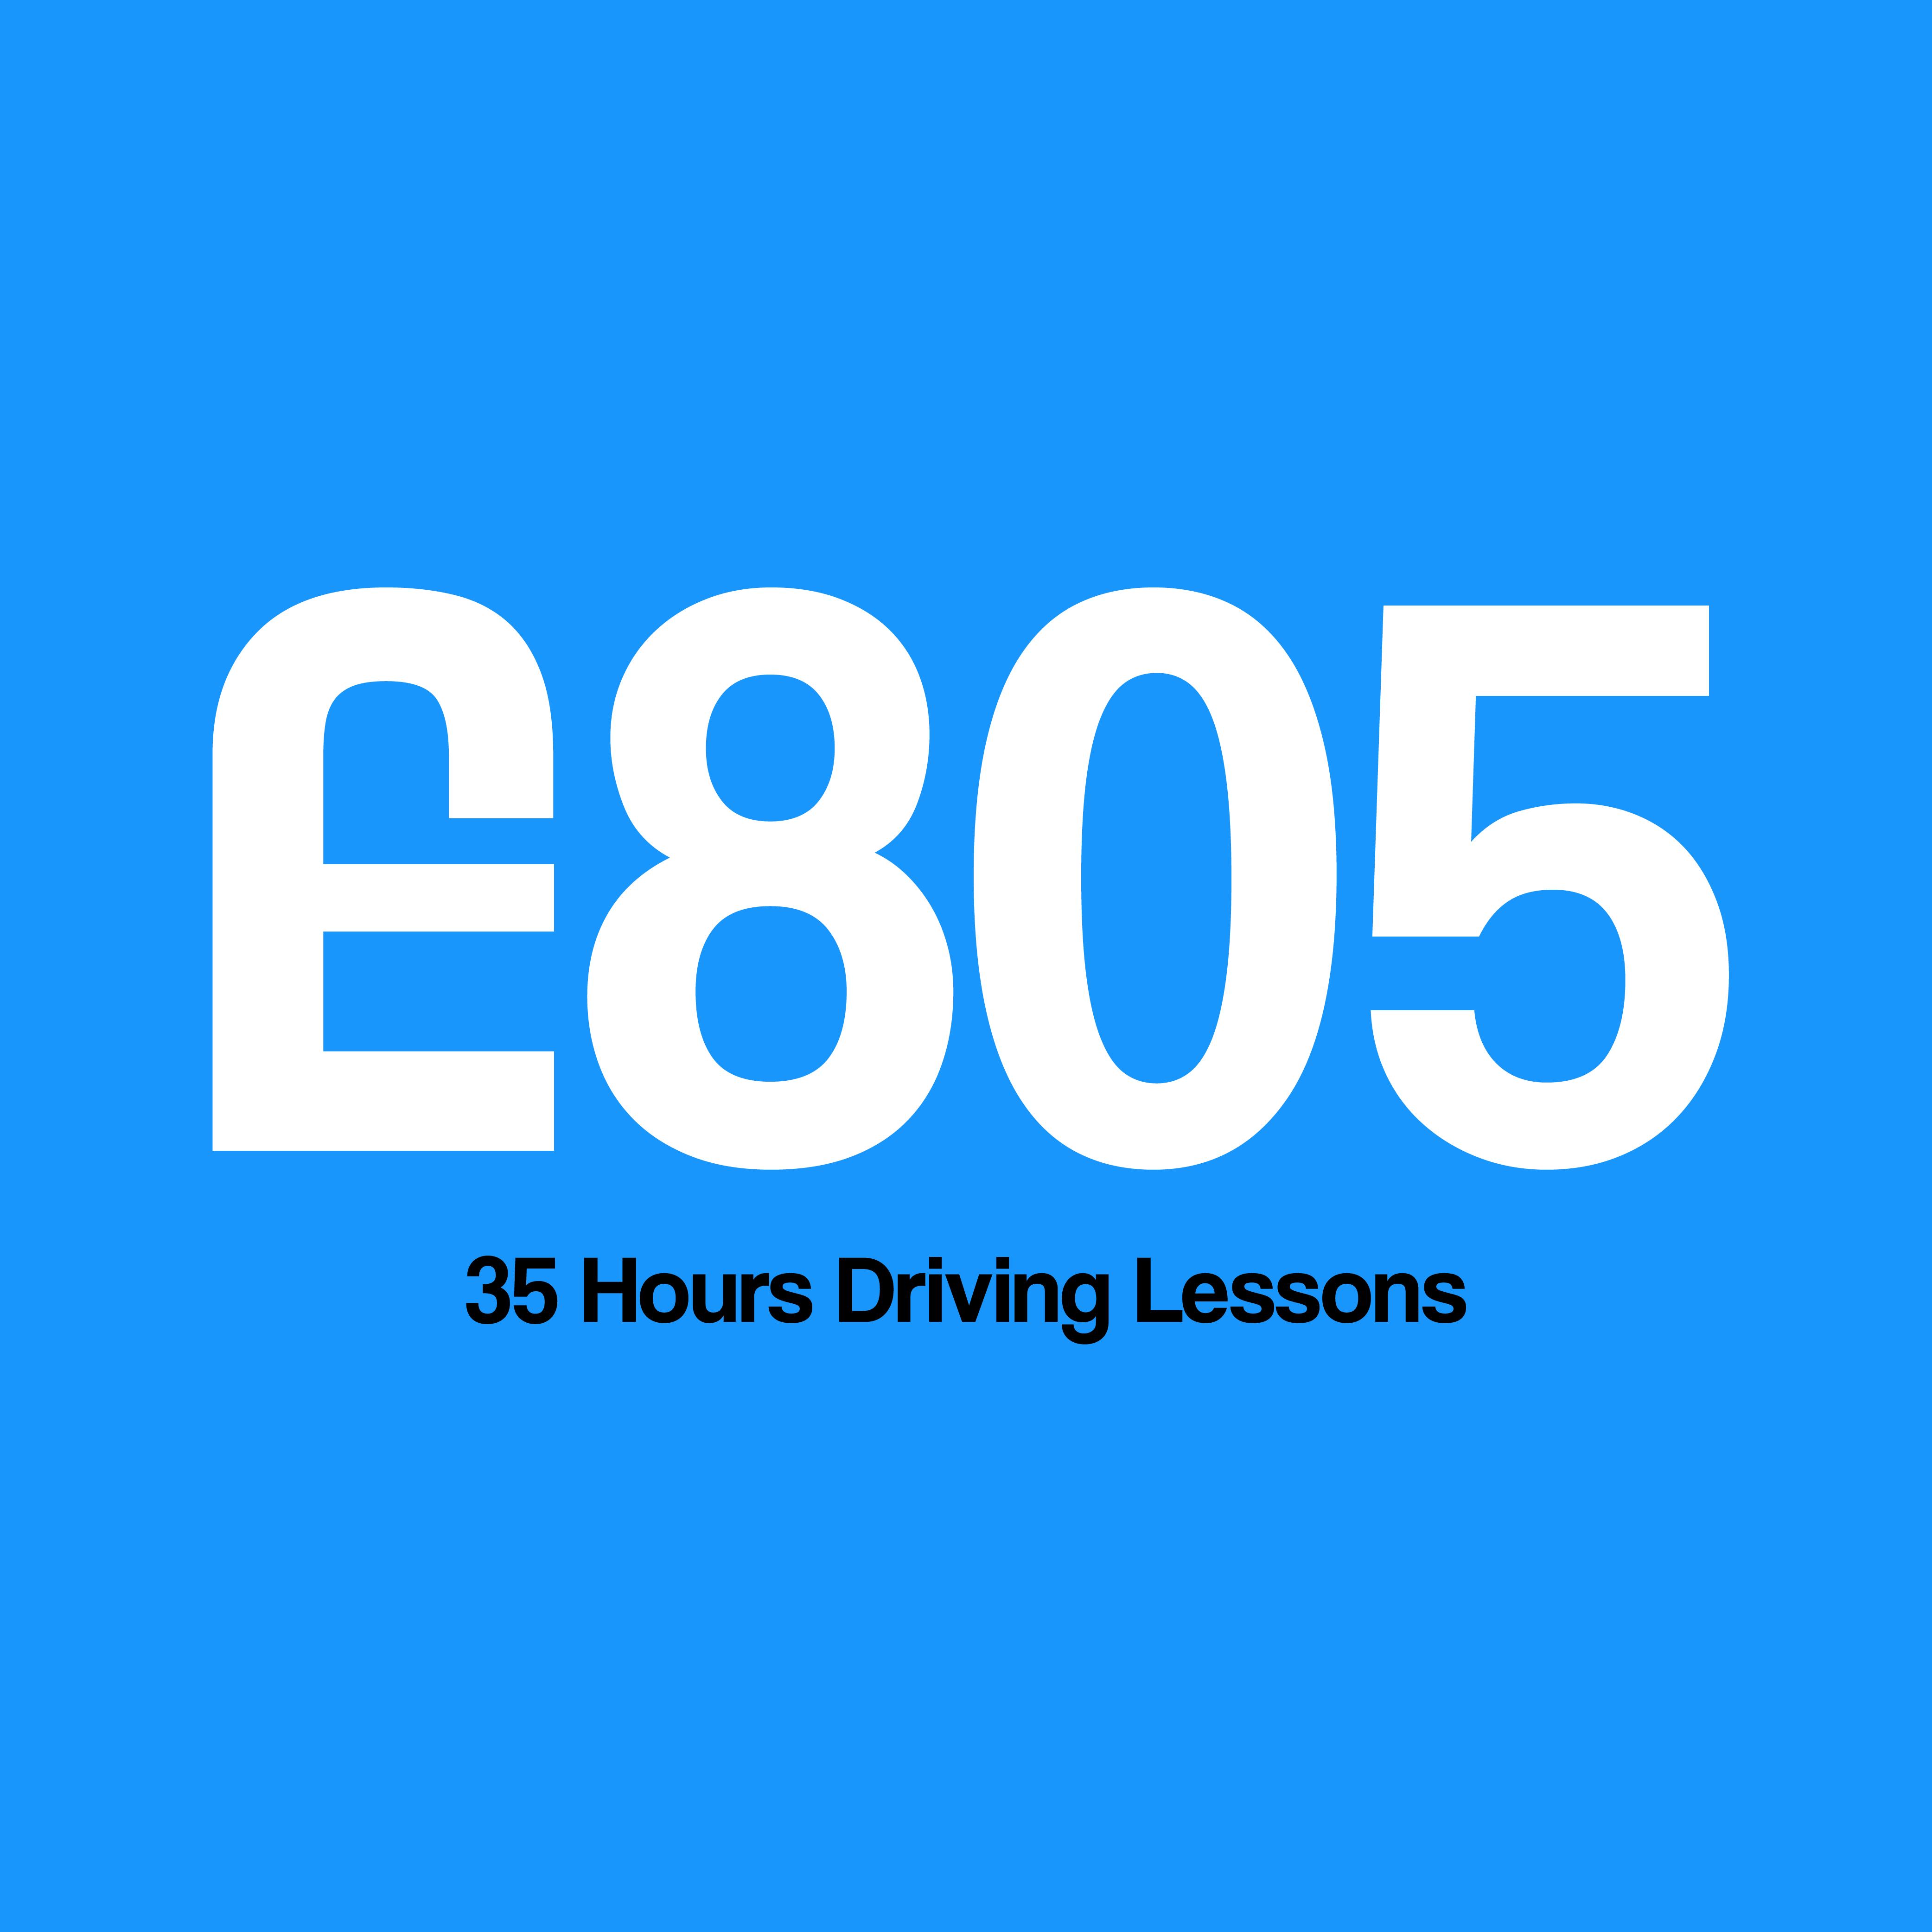 DSM School Of Motoring 35 Hours Driving Lessons